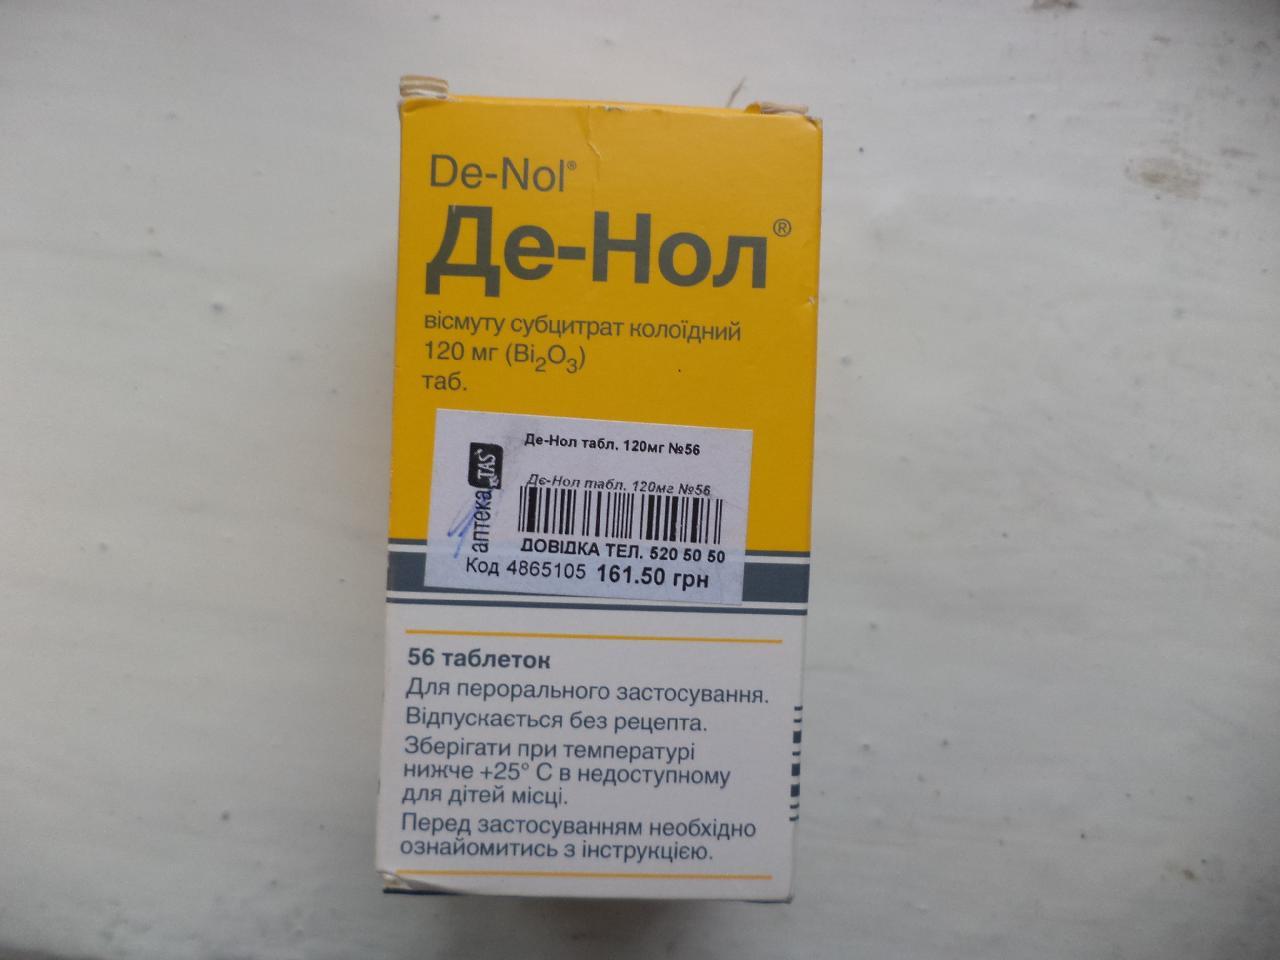 таблетки при панкреатите у детей